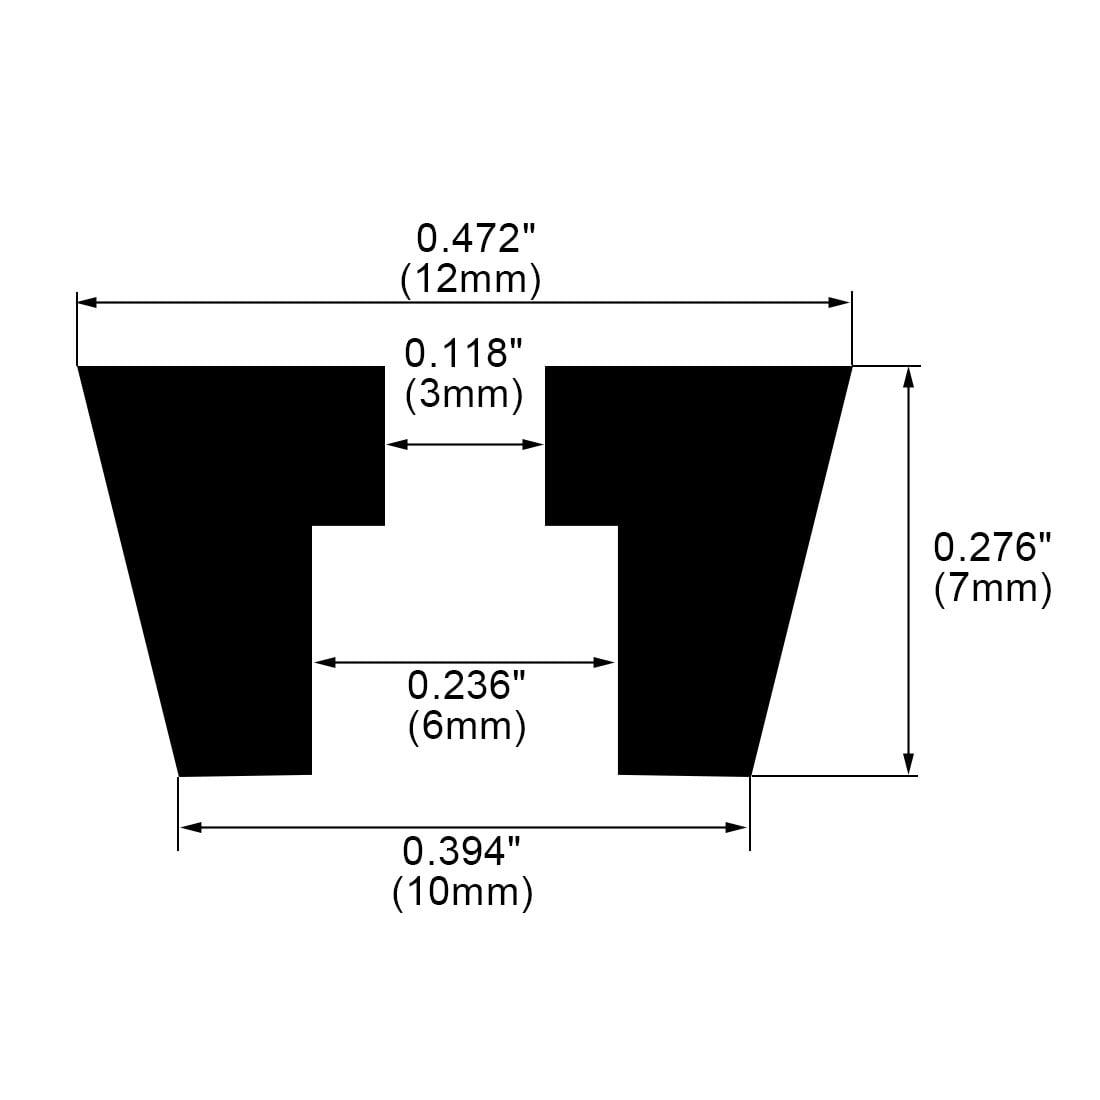 14pcs Rubber Feet Bumper Amplifier Speaker Cutting Board Leg Pads, D12x10xH7mm - image 4 de 7